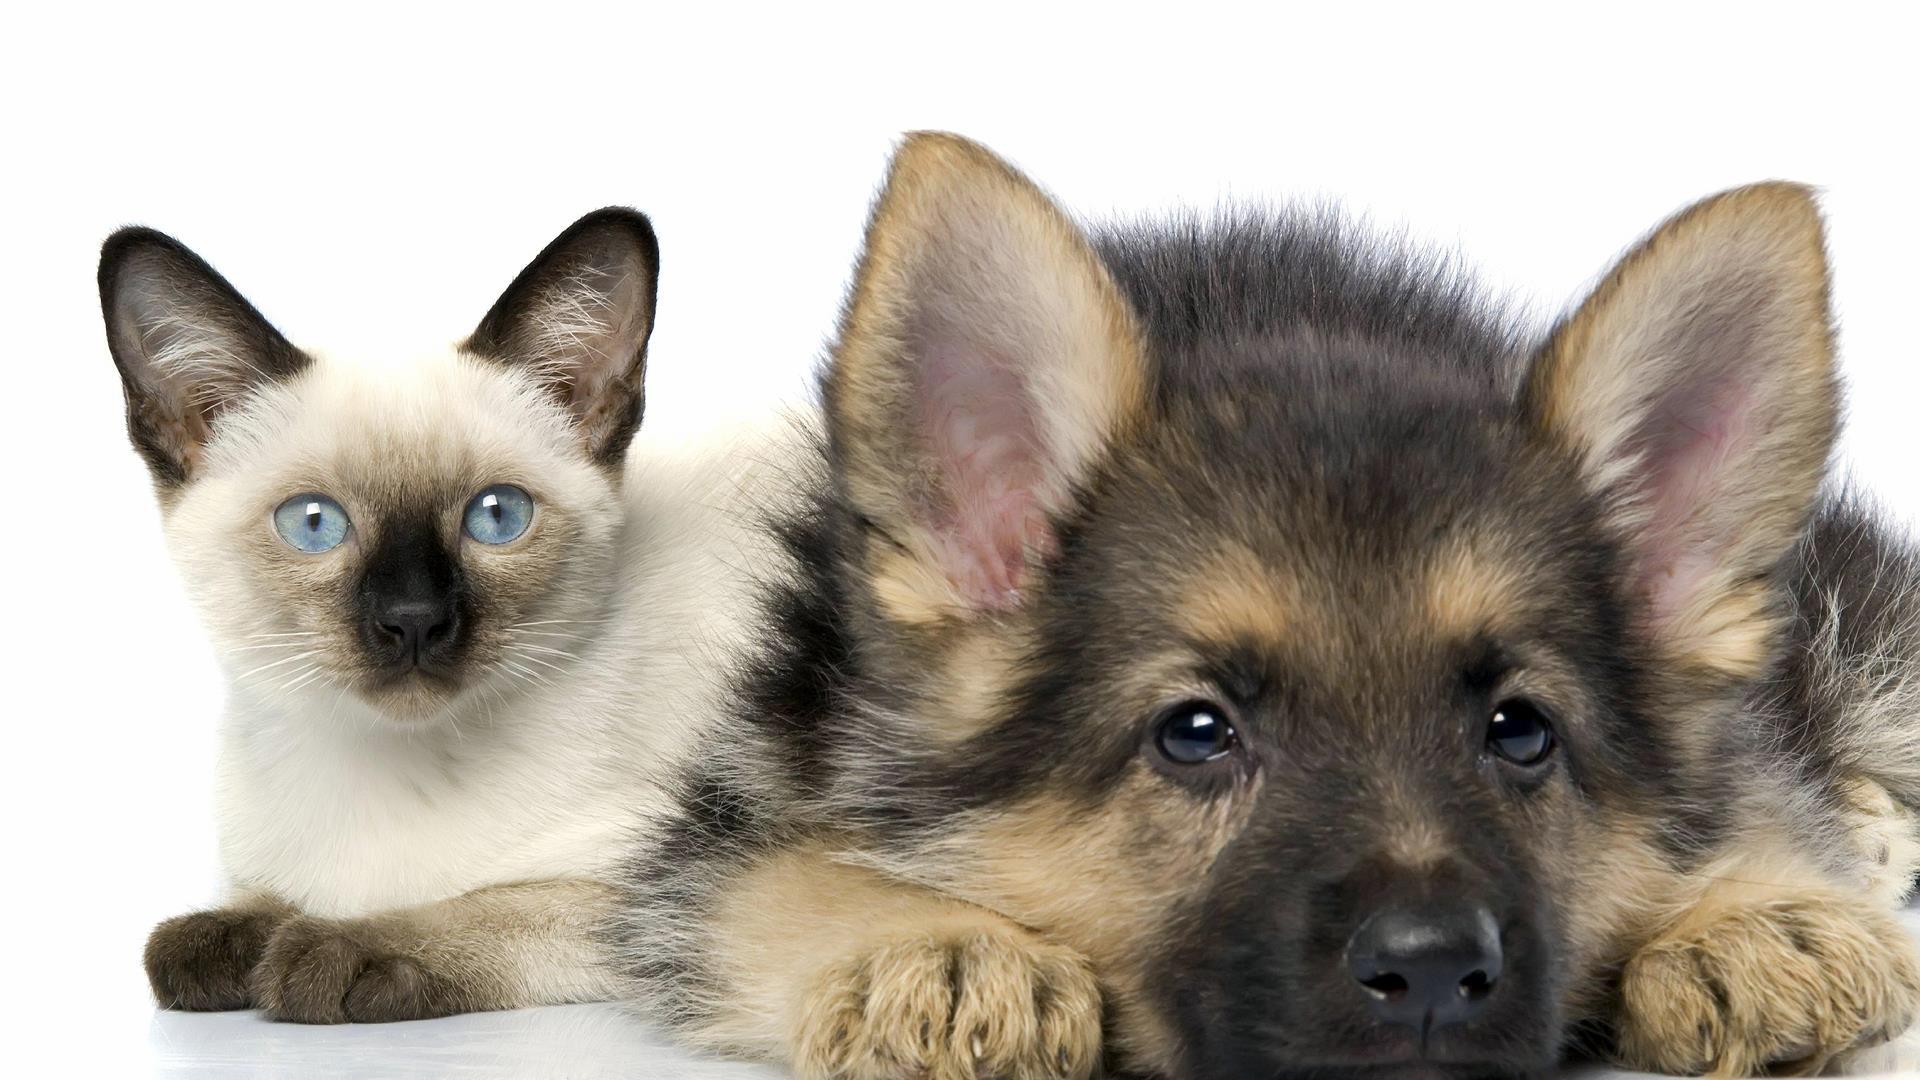 cute cat dog   Animals Wallpaper 34497785 1920x1080